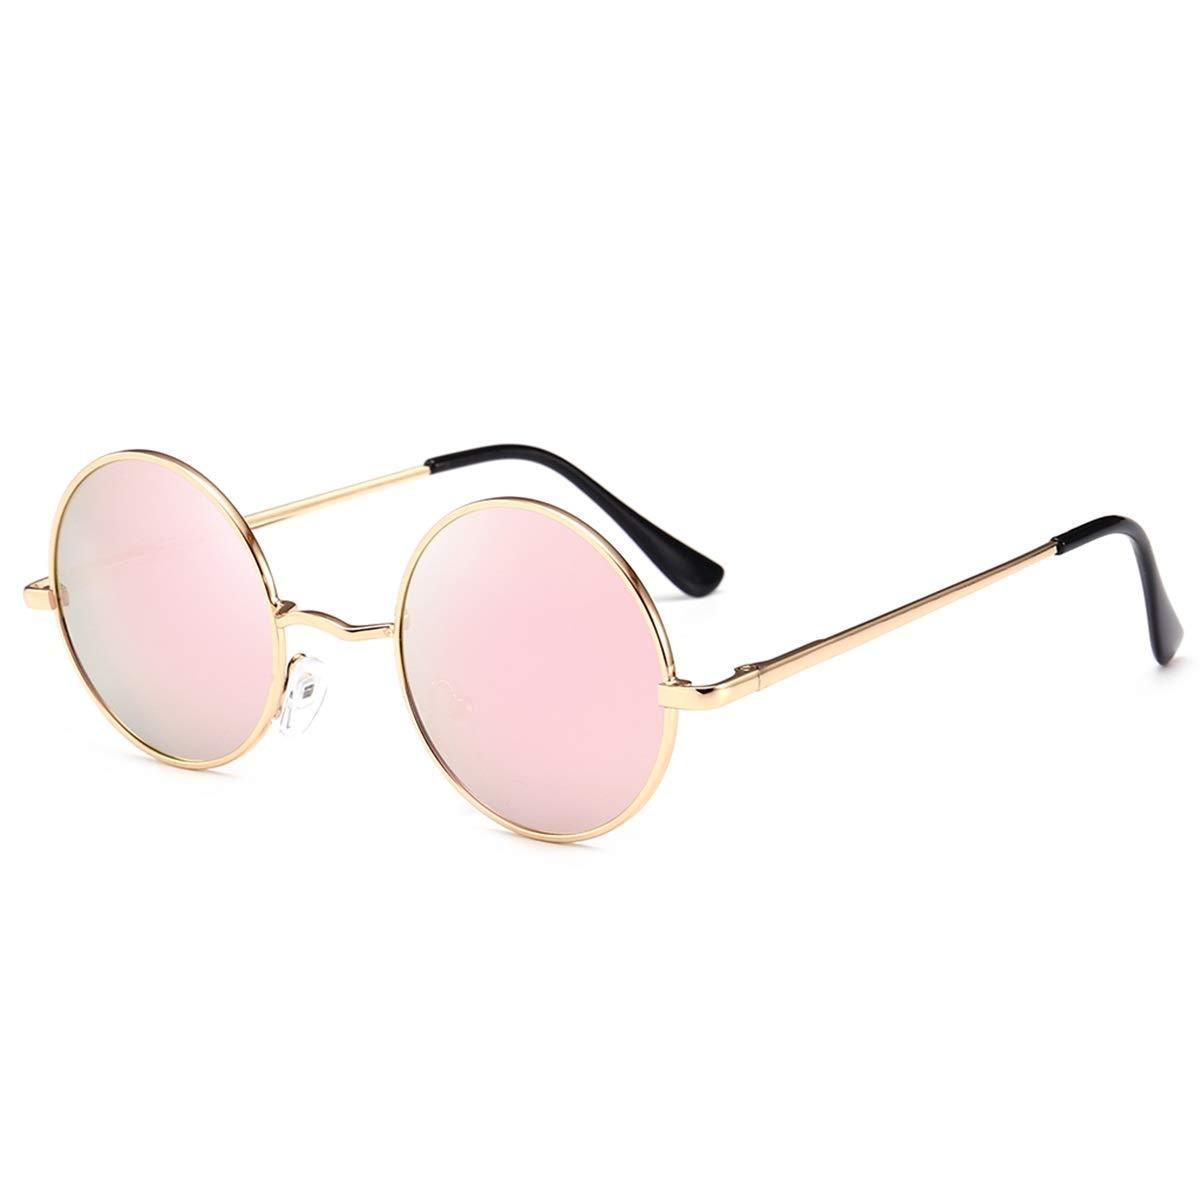 Color : Silver Frame+Black-Grey Lens BZ689 Premium Classic Fashion Polarized Round Sunglasses Men Women Vintage Retro Mirror Coating Sun Glasses